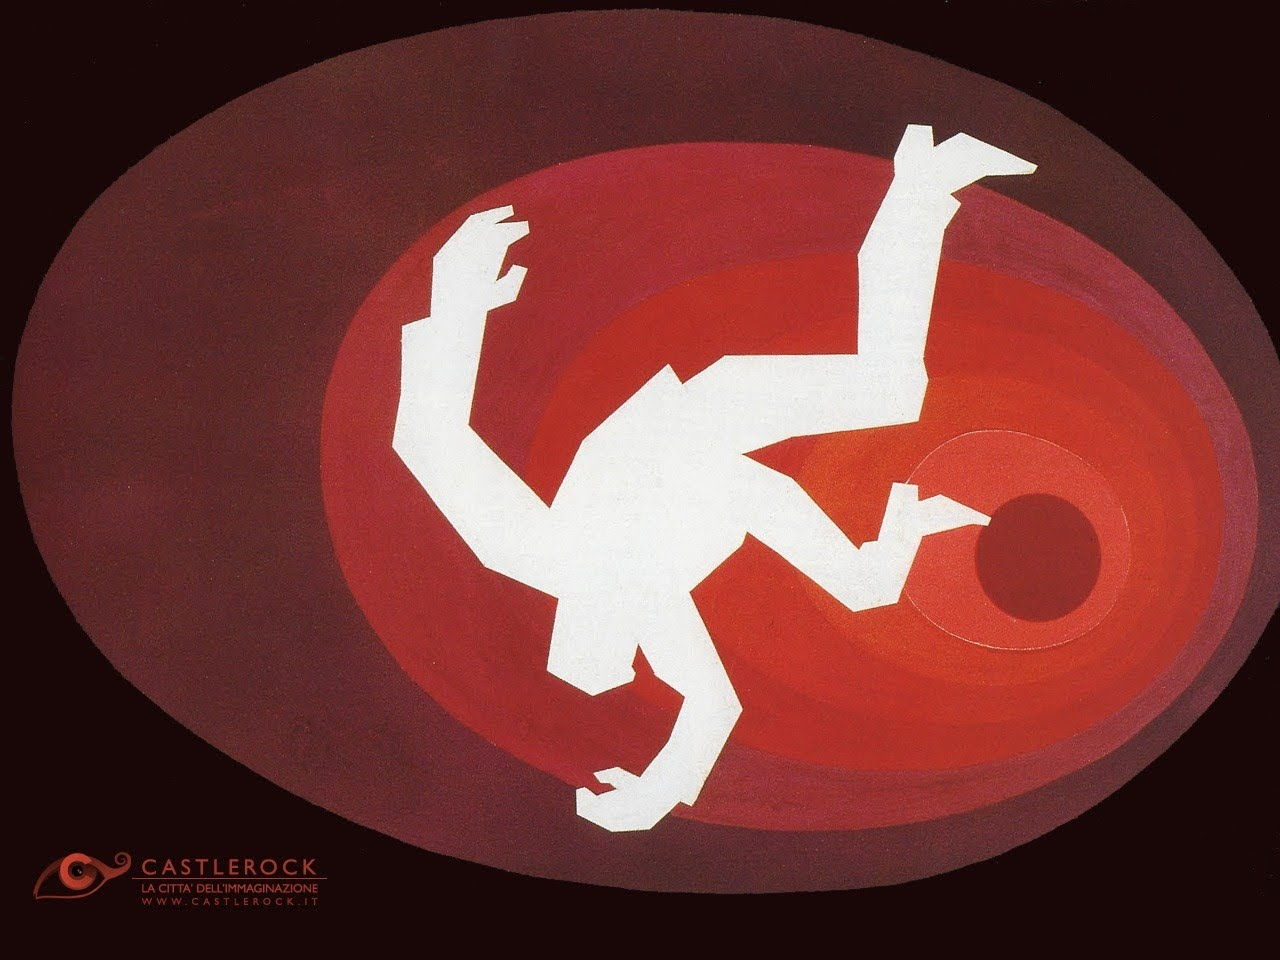 http://3.bp.blogspot.com/_lv8gvHZ8808/S8bLbJGmNYI/AAAAAAAAABY/K8zcO9TQqJA/s1600/wallpaper-del-film-profondo-rosso-62097.jpg